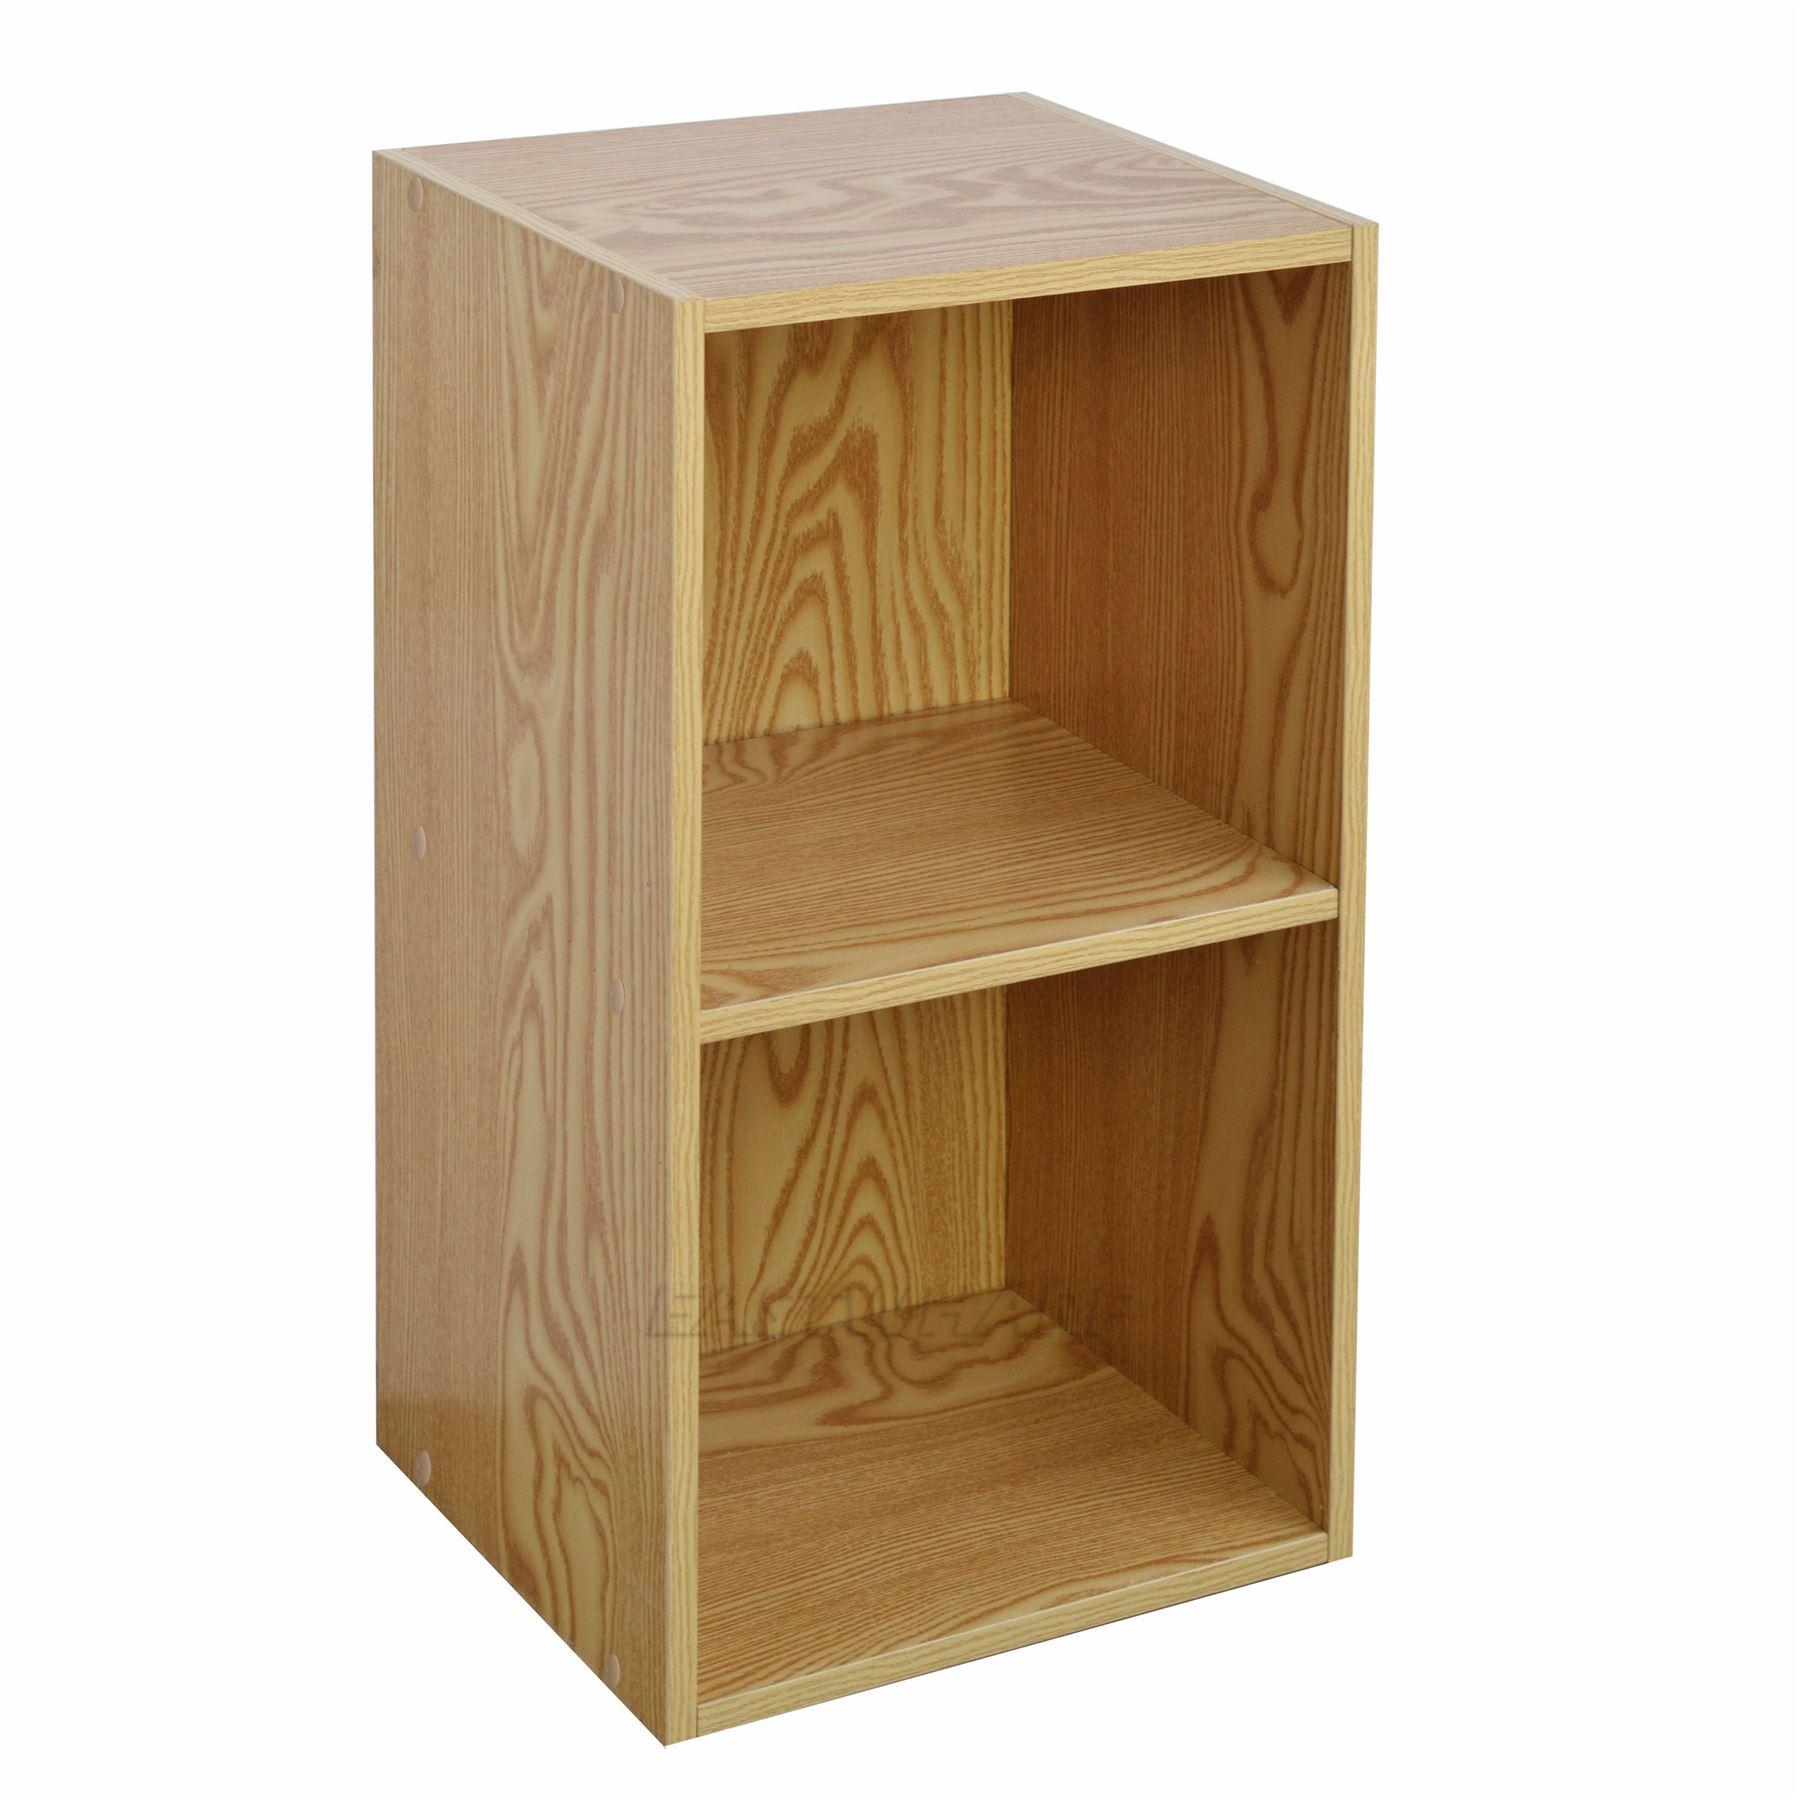 Wooden Display Shelf ~ Wooden bookcase shelving display storage wood shelf